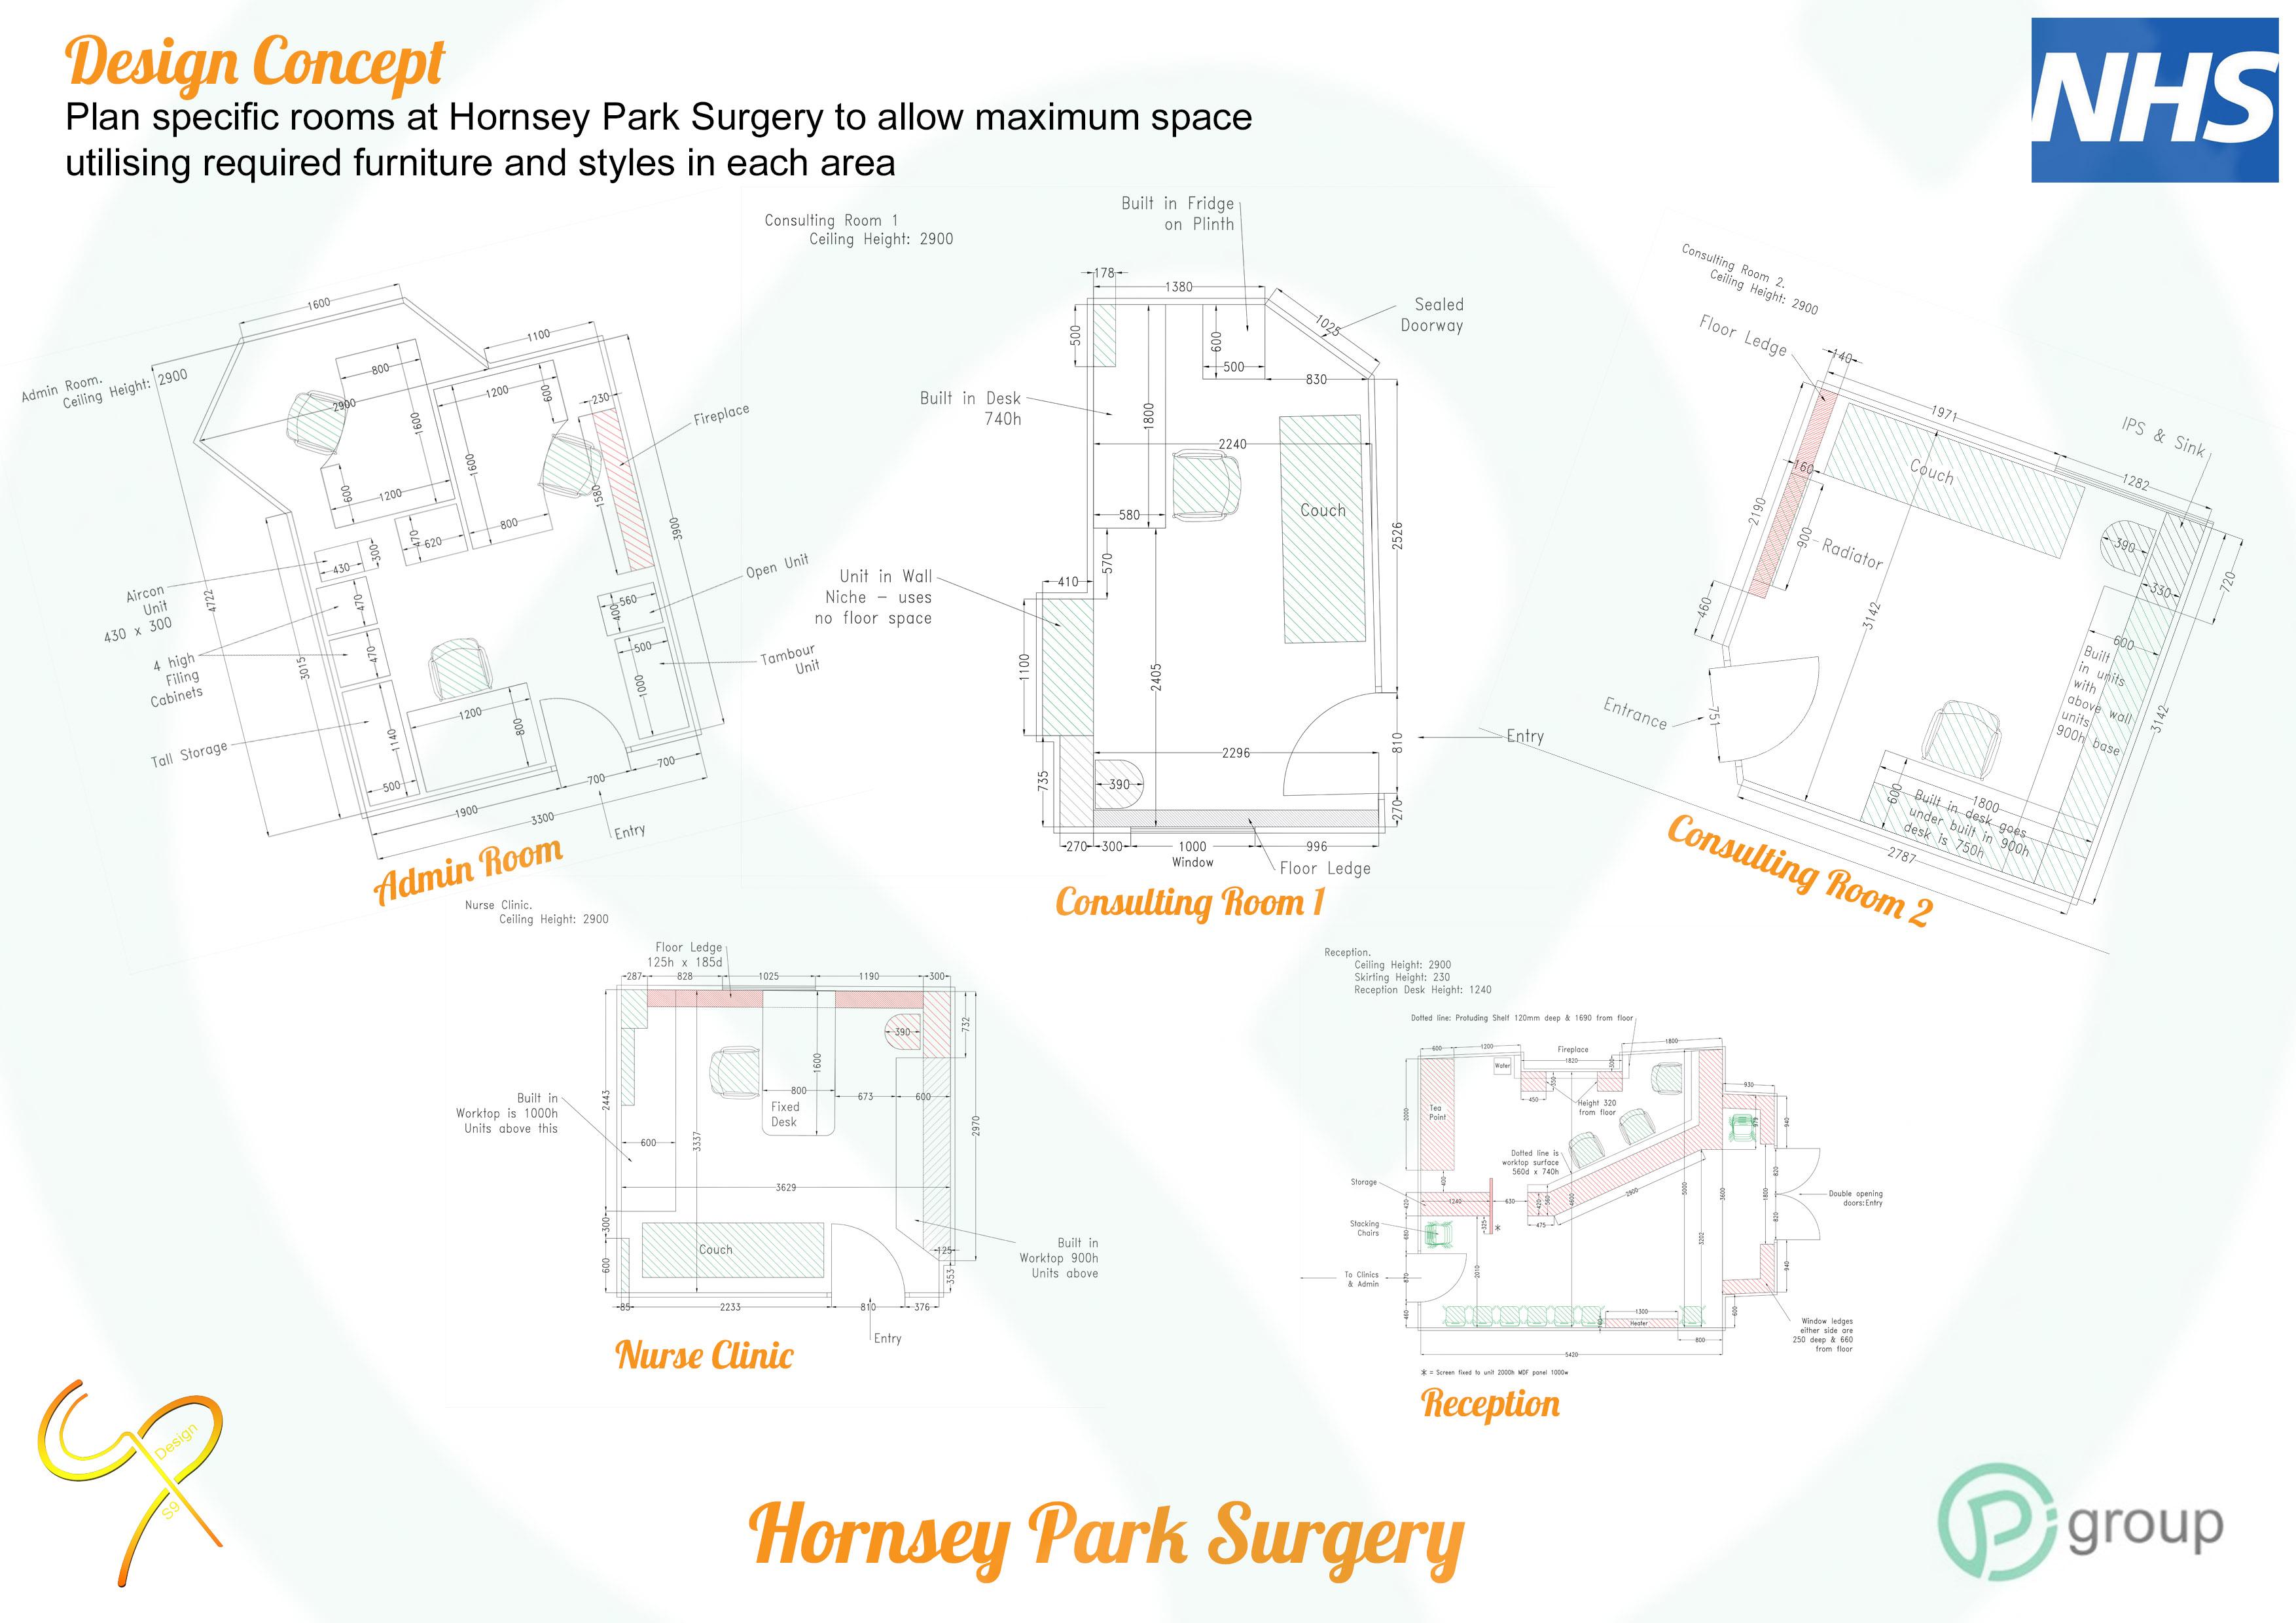 Pi Group - Hornsey Park Surgery